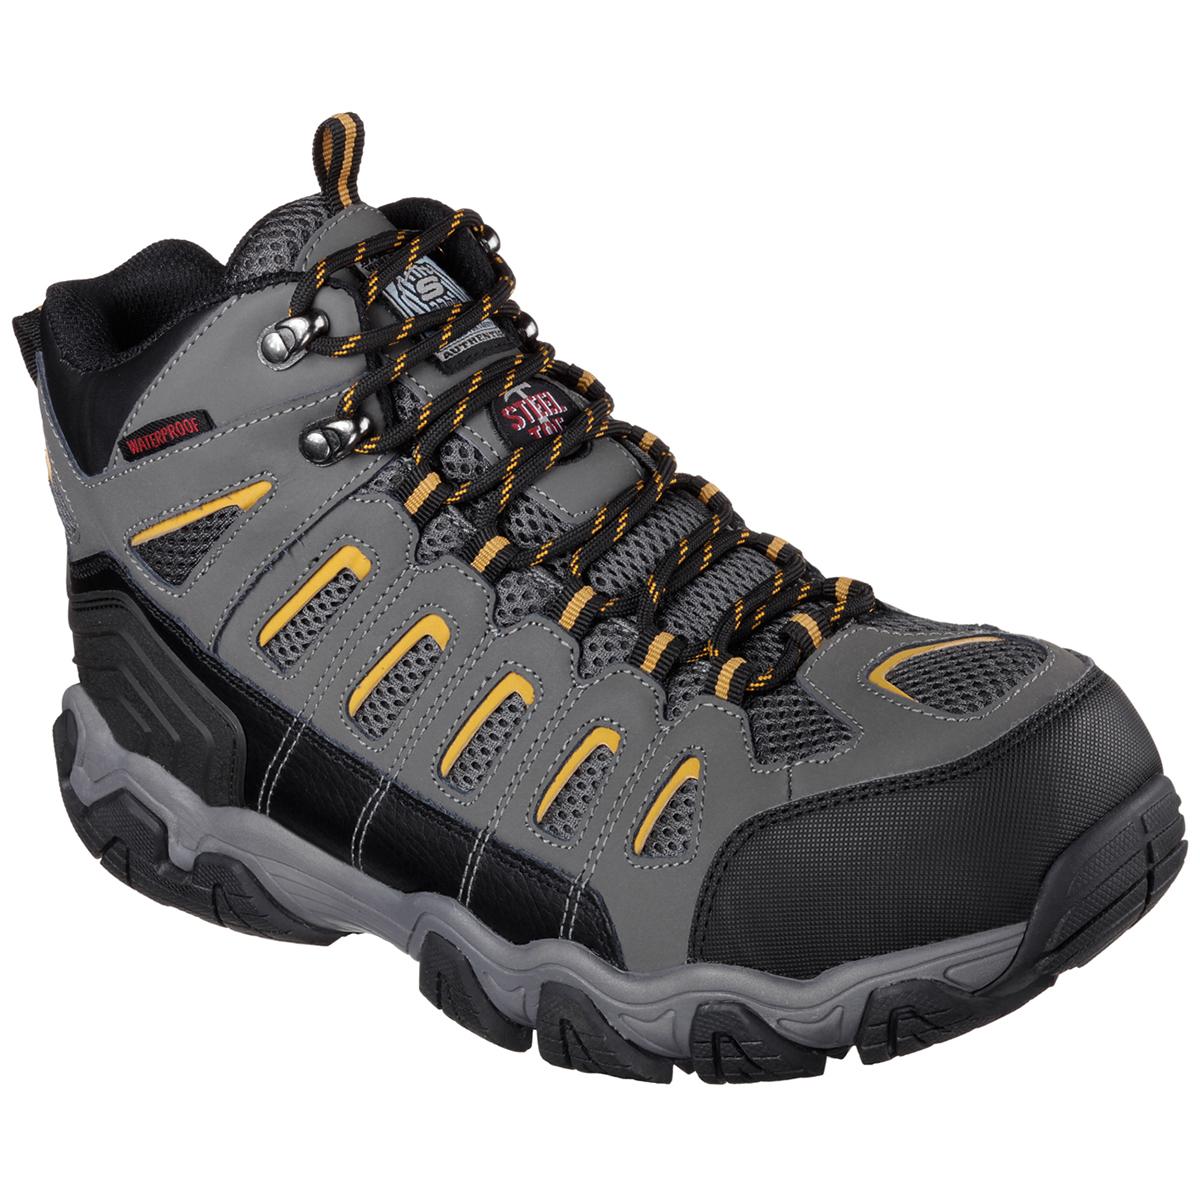 Skechers Men's Blais Bixford Steel Toe Work Shoes - Black, 10.5